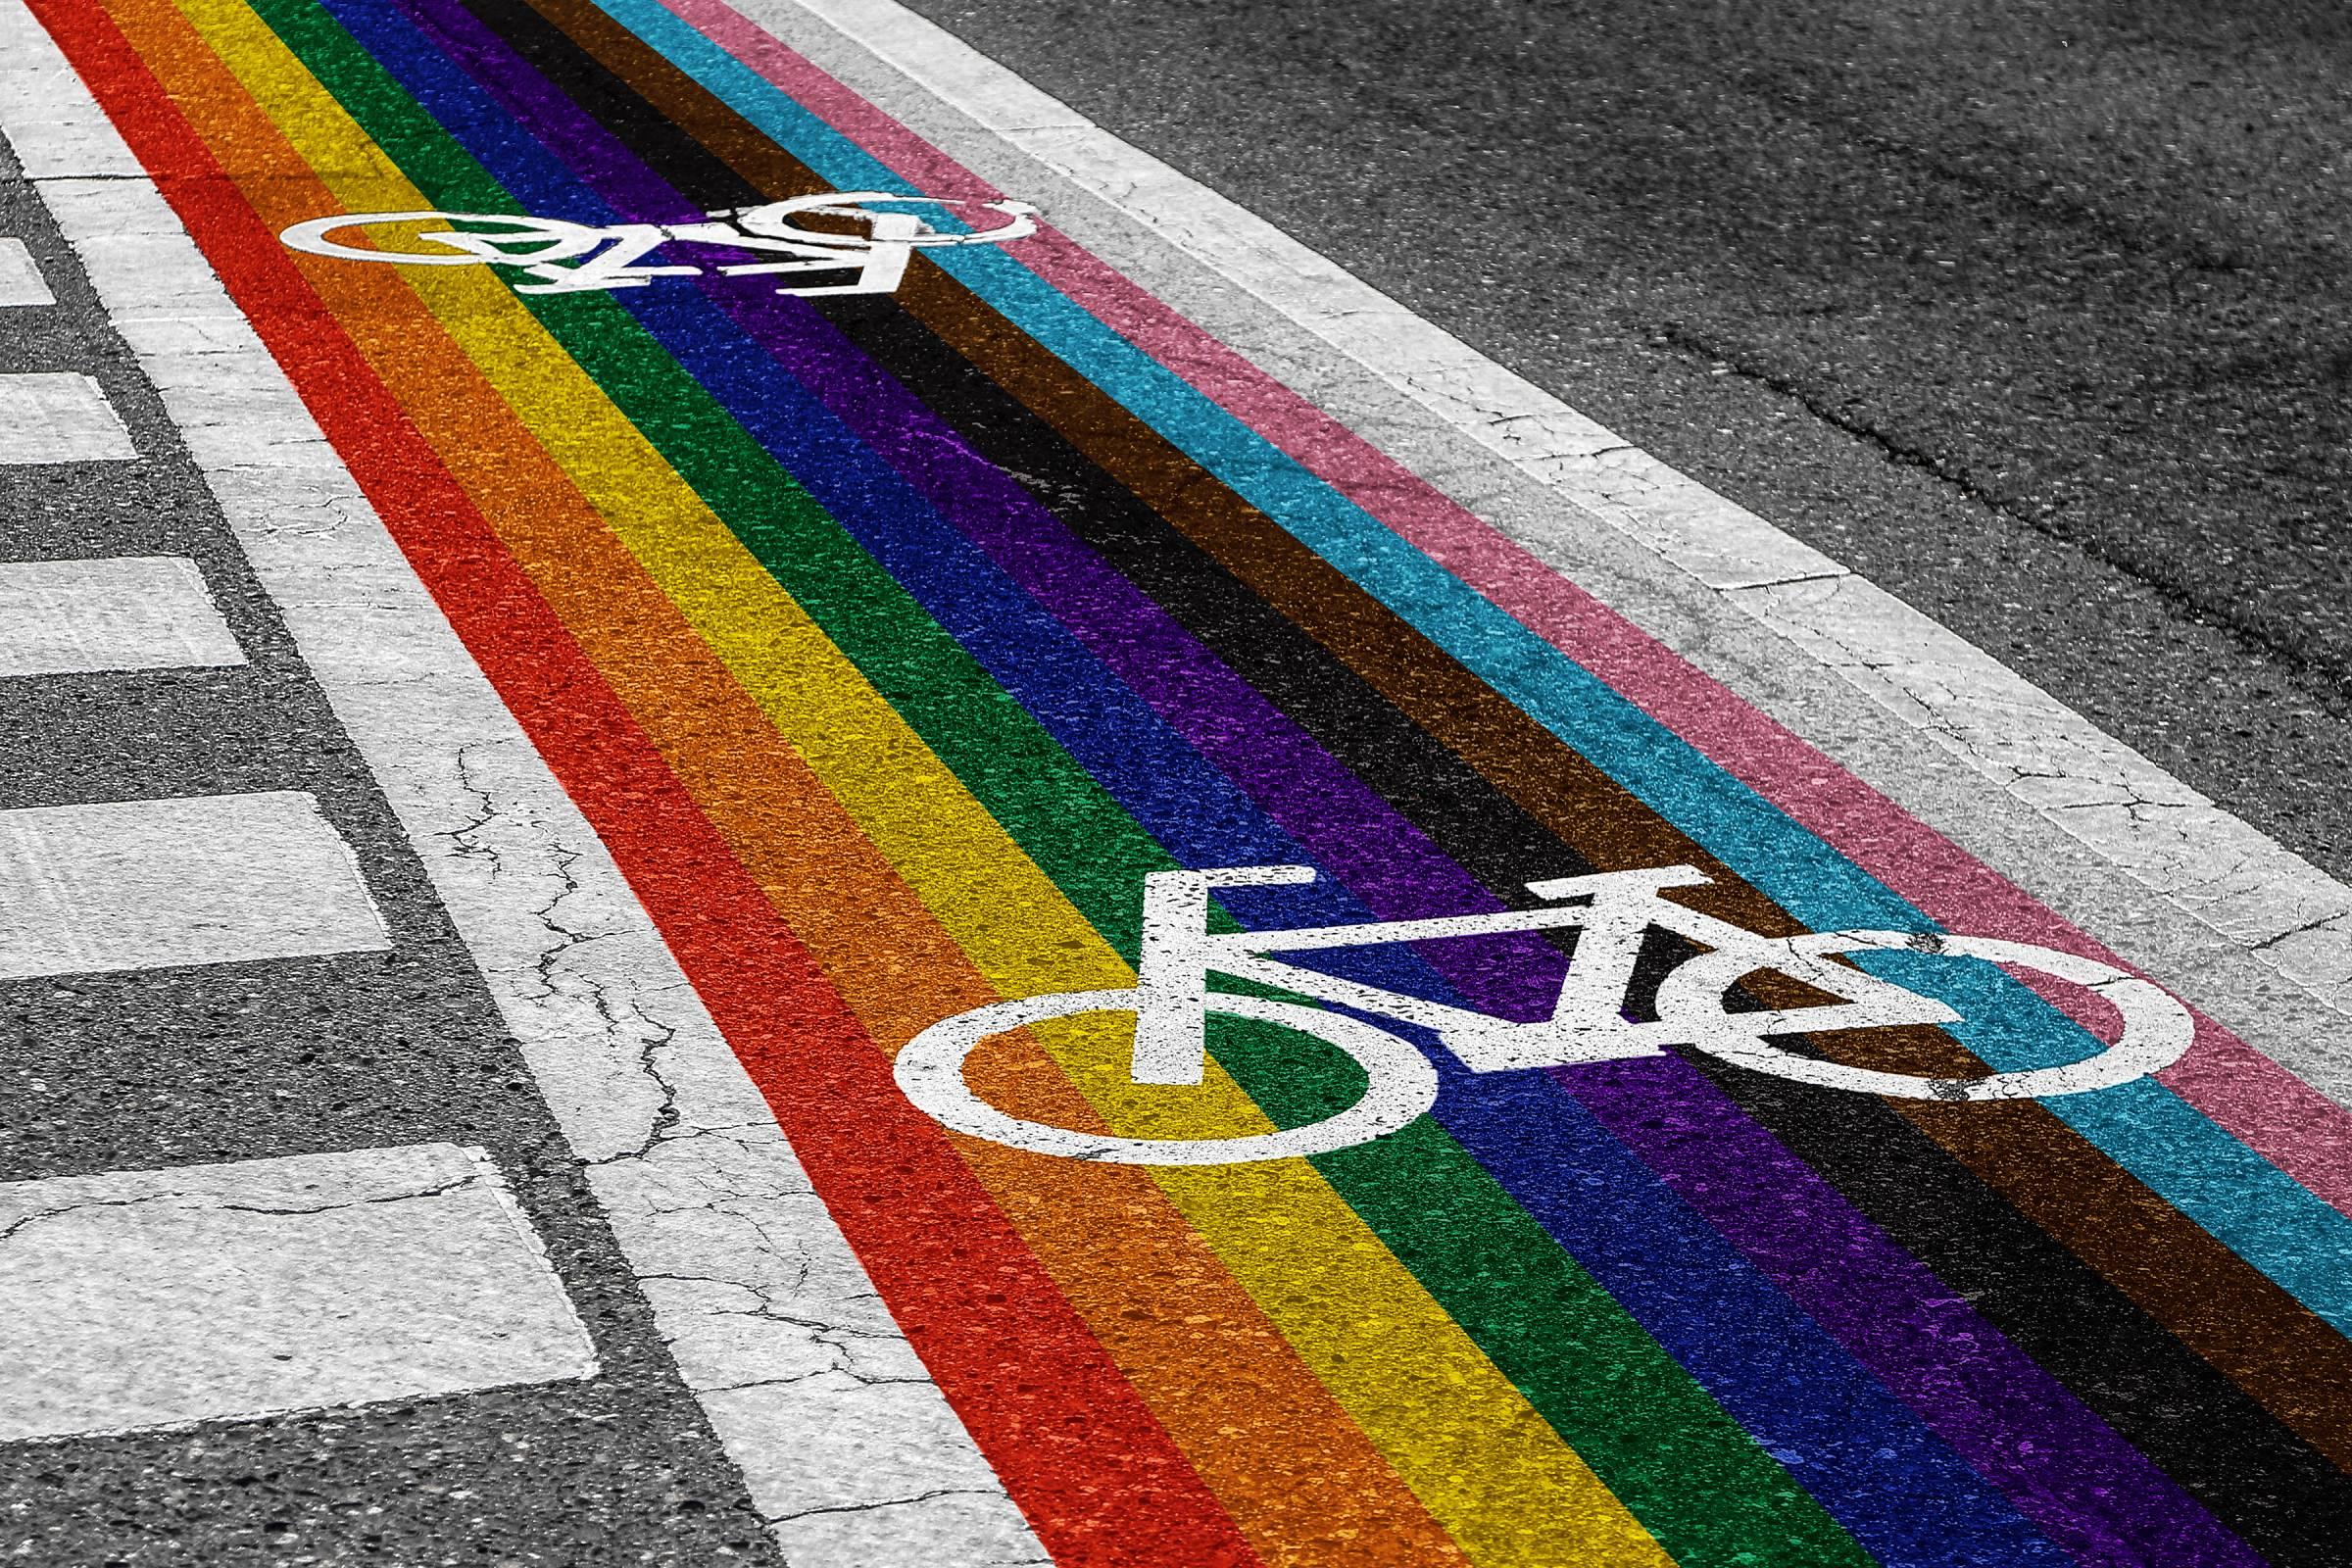 rainbow striped bike lane for pride on pavement road